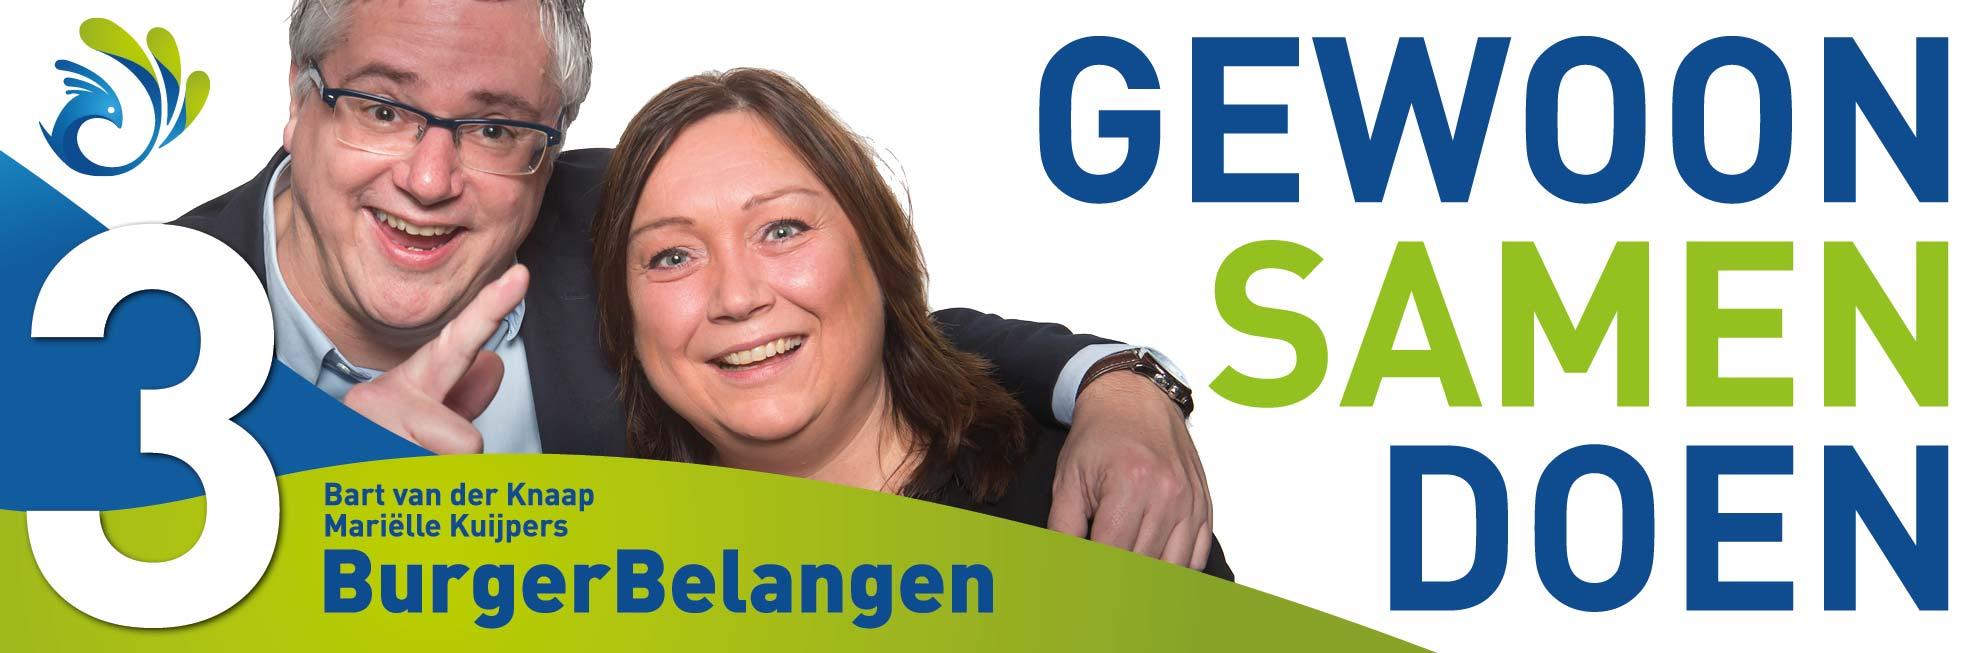 BurgerBelangenErmelo.nl